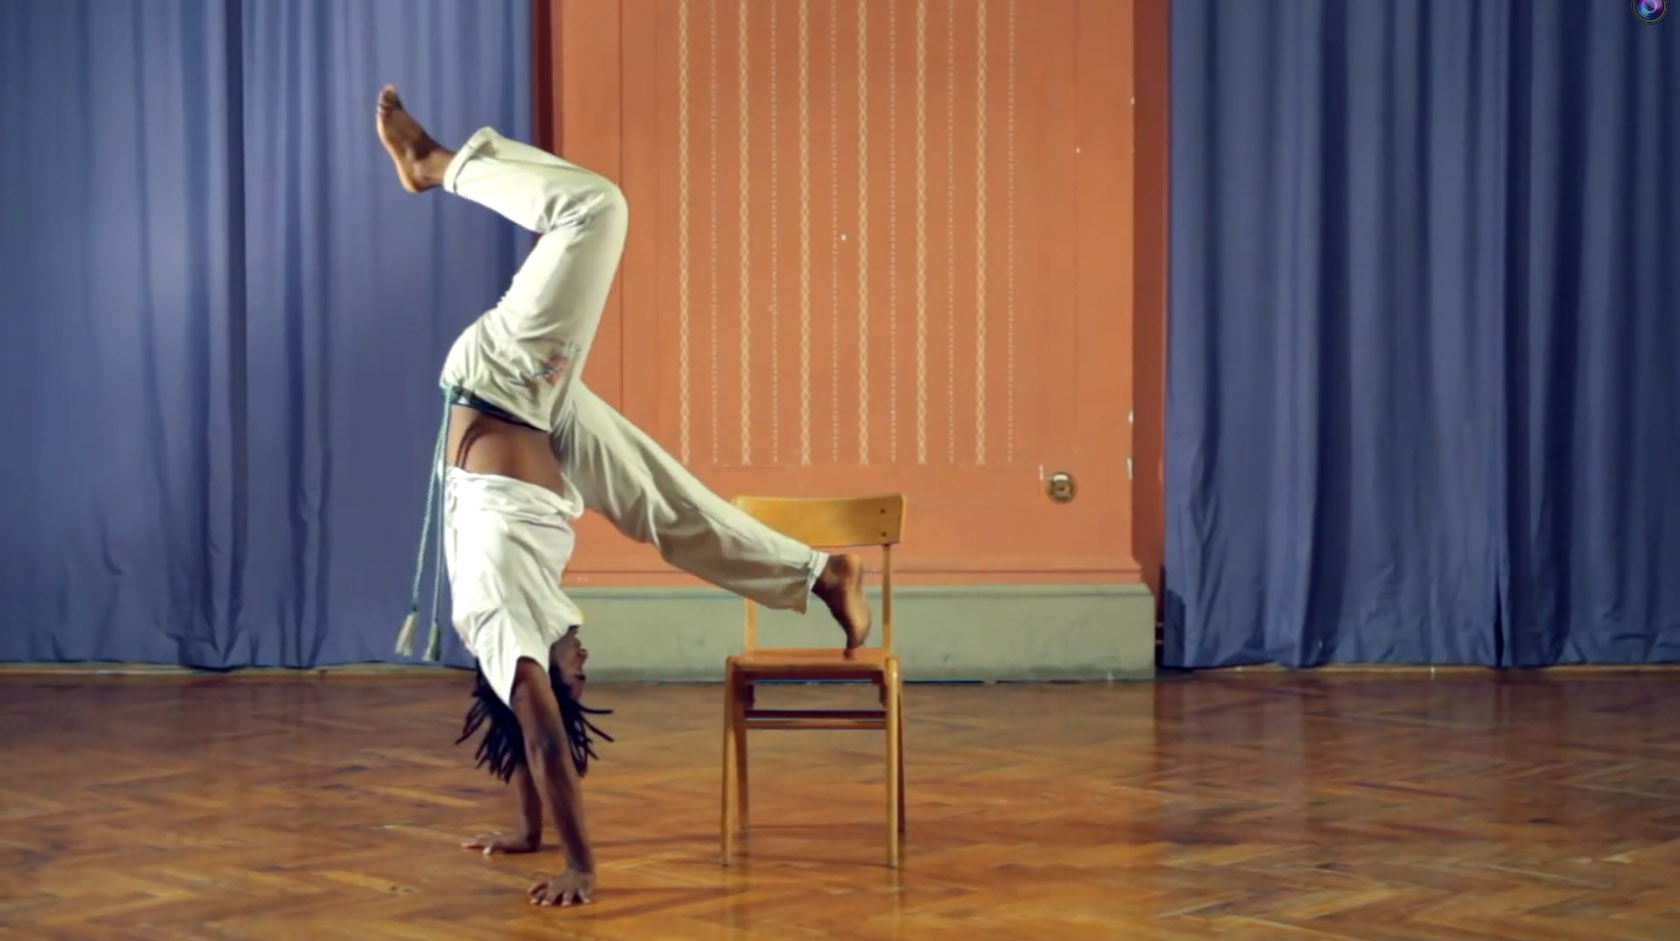 Beautiful Capoeira: Mestre Xuxo Edition App Commercial – Lev